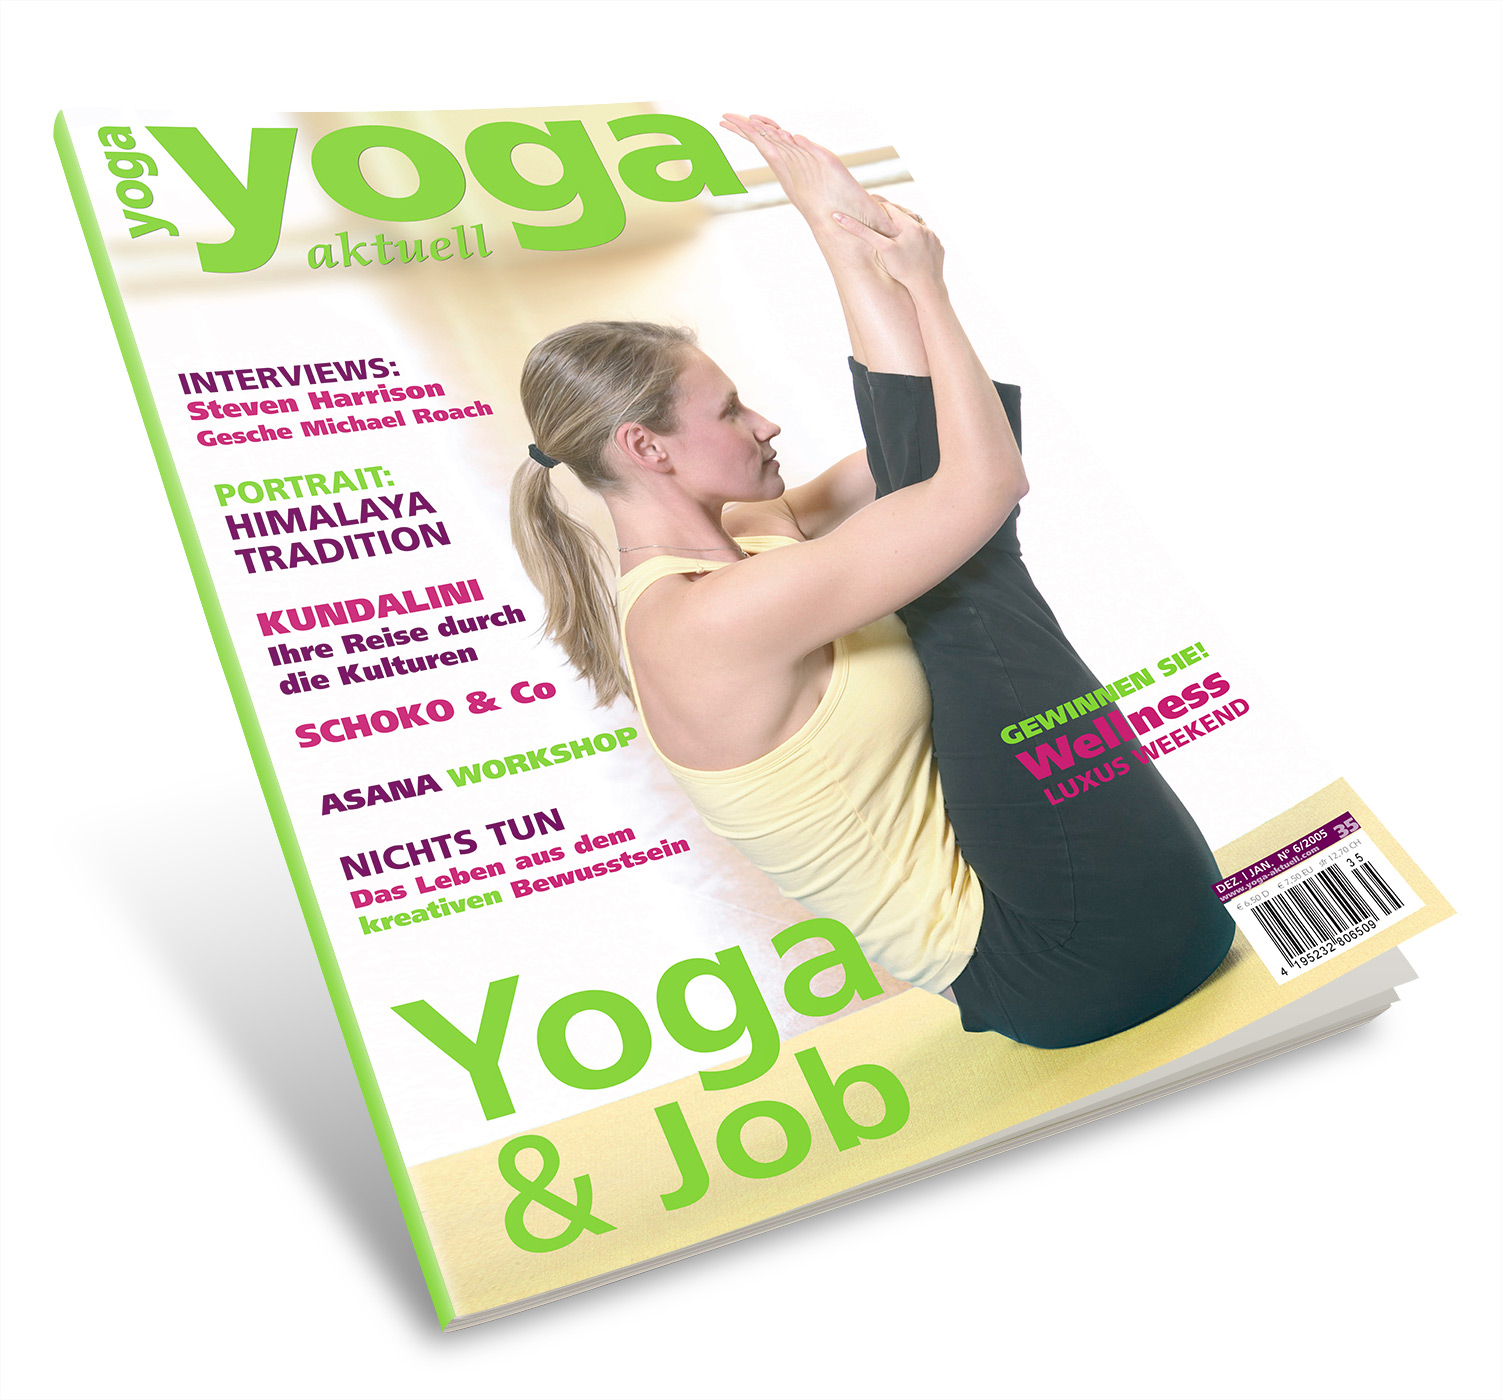 Yoga Aktuell 35 - 06/2005